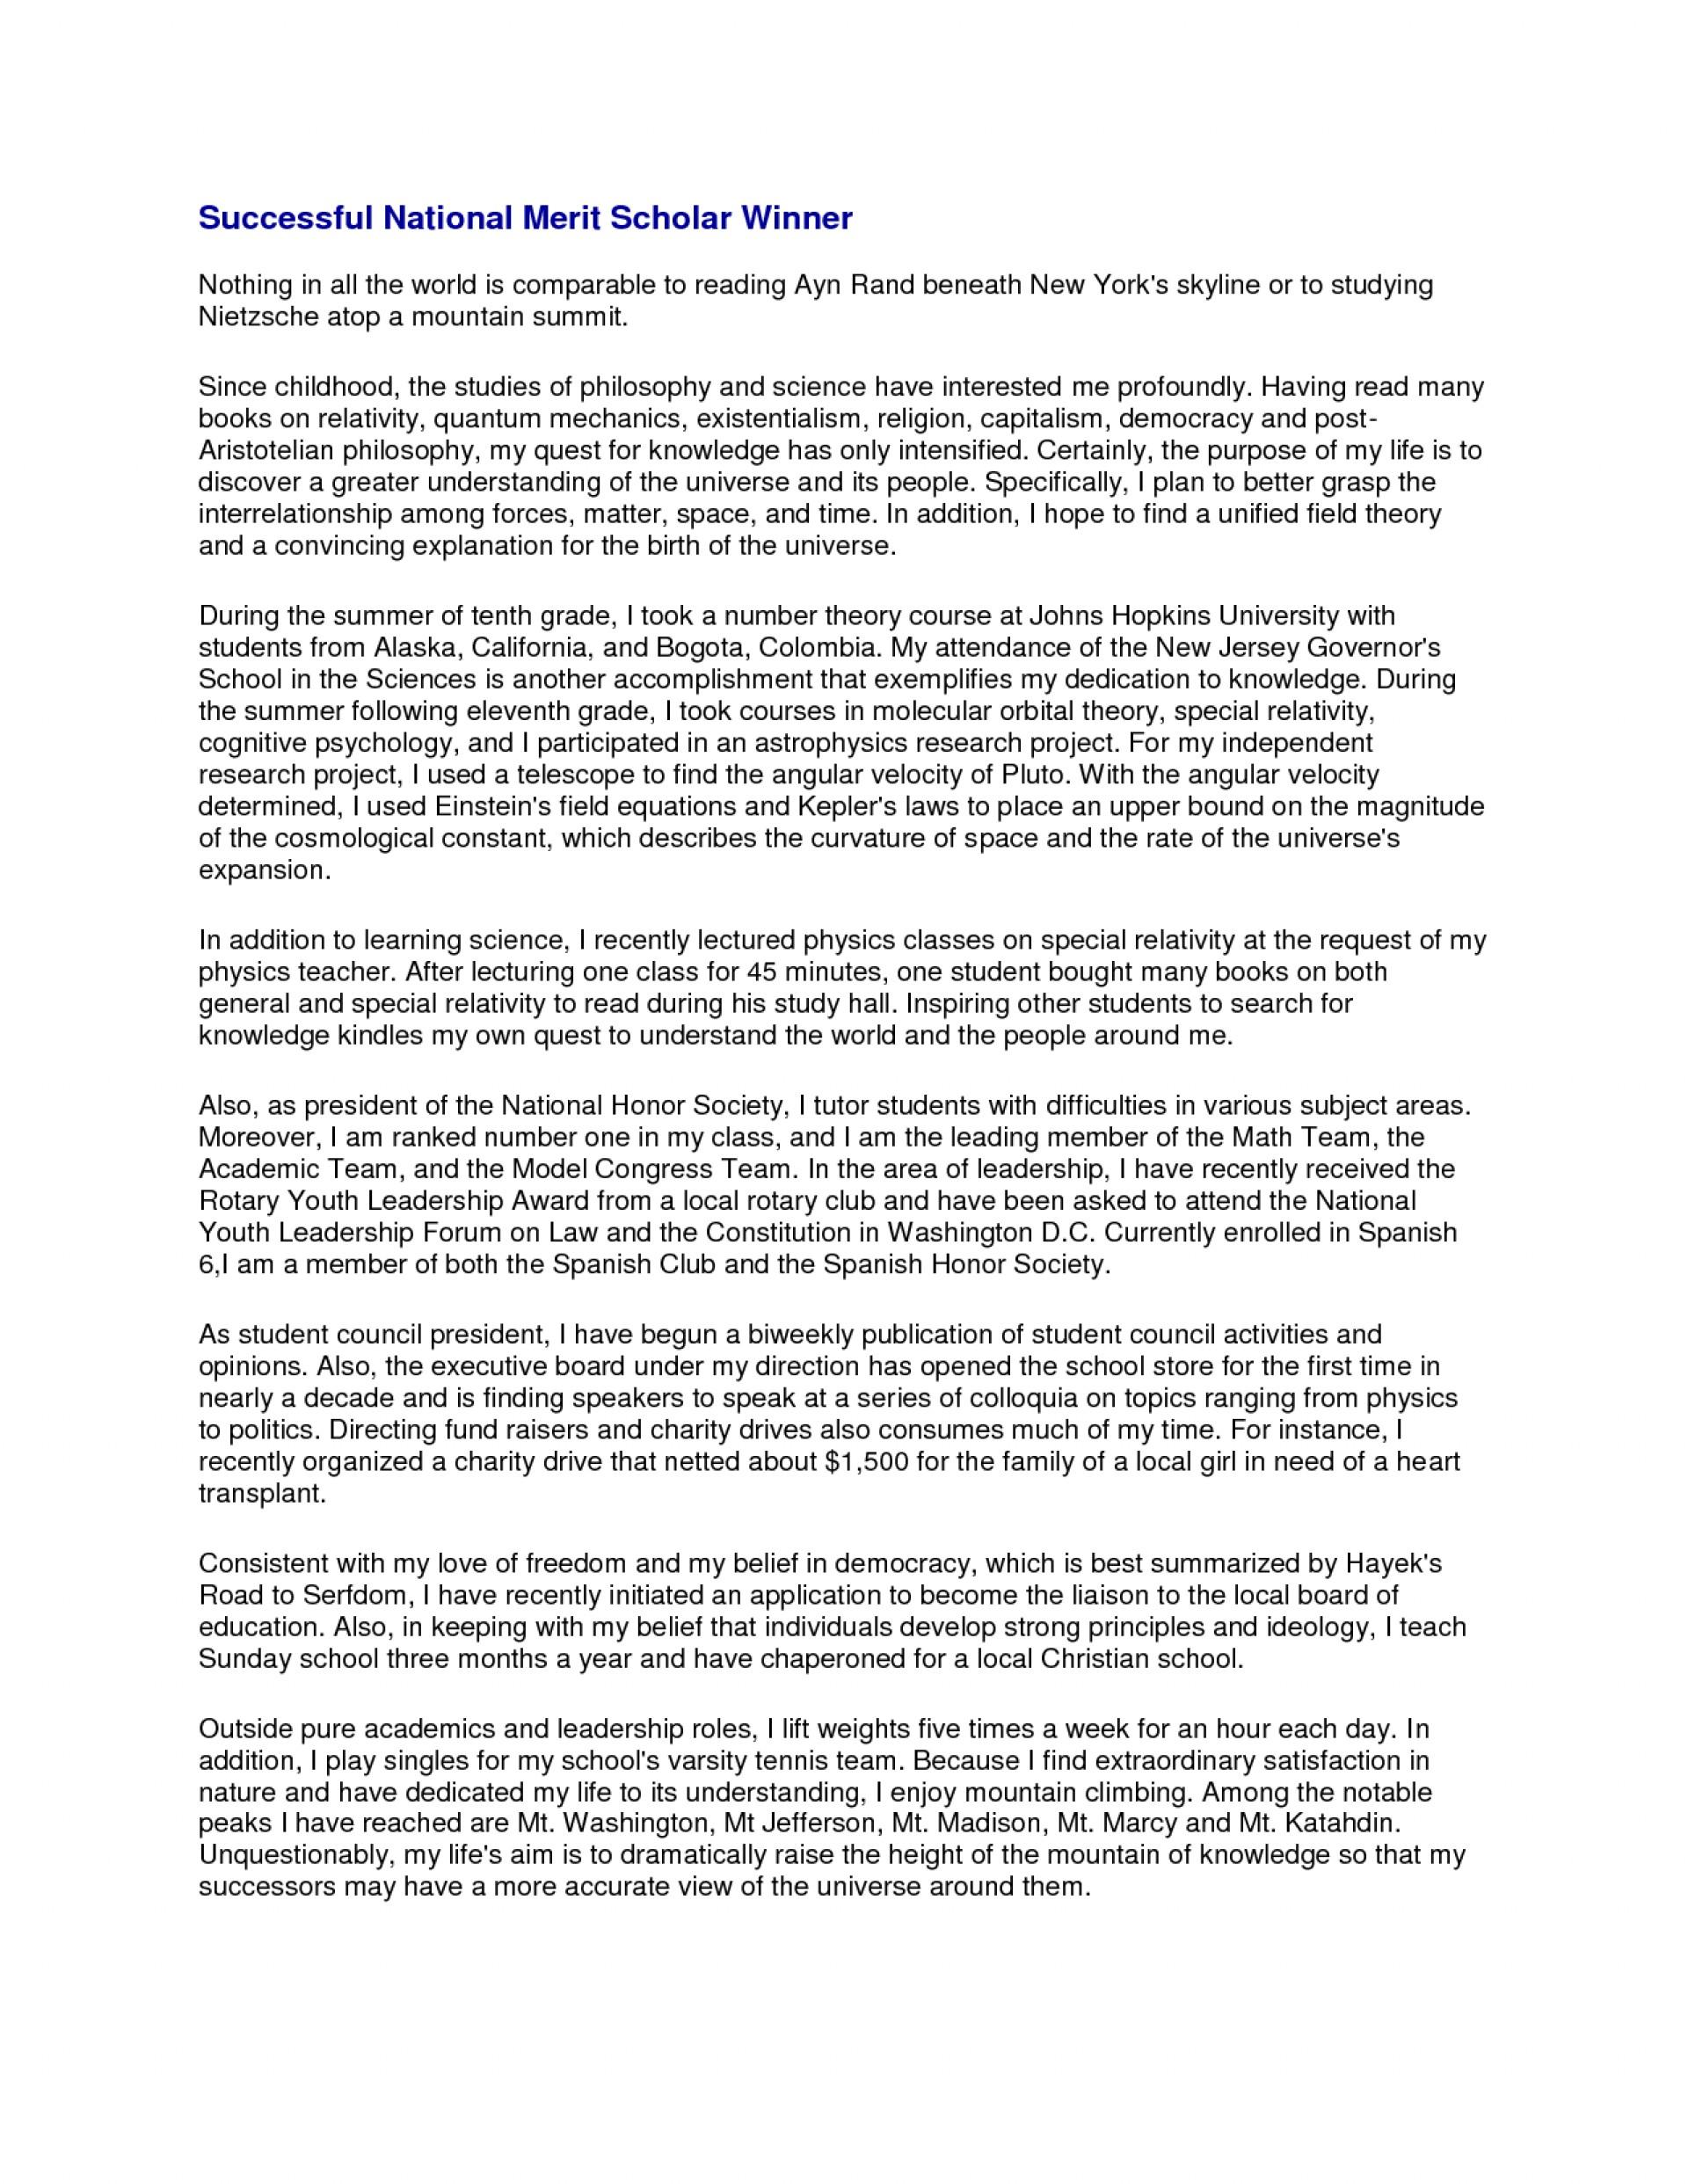 015 Scholarship Essay Sample Example Stunning Leadership For Mba 1920